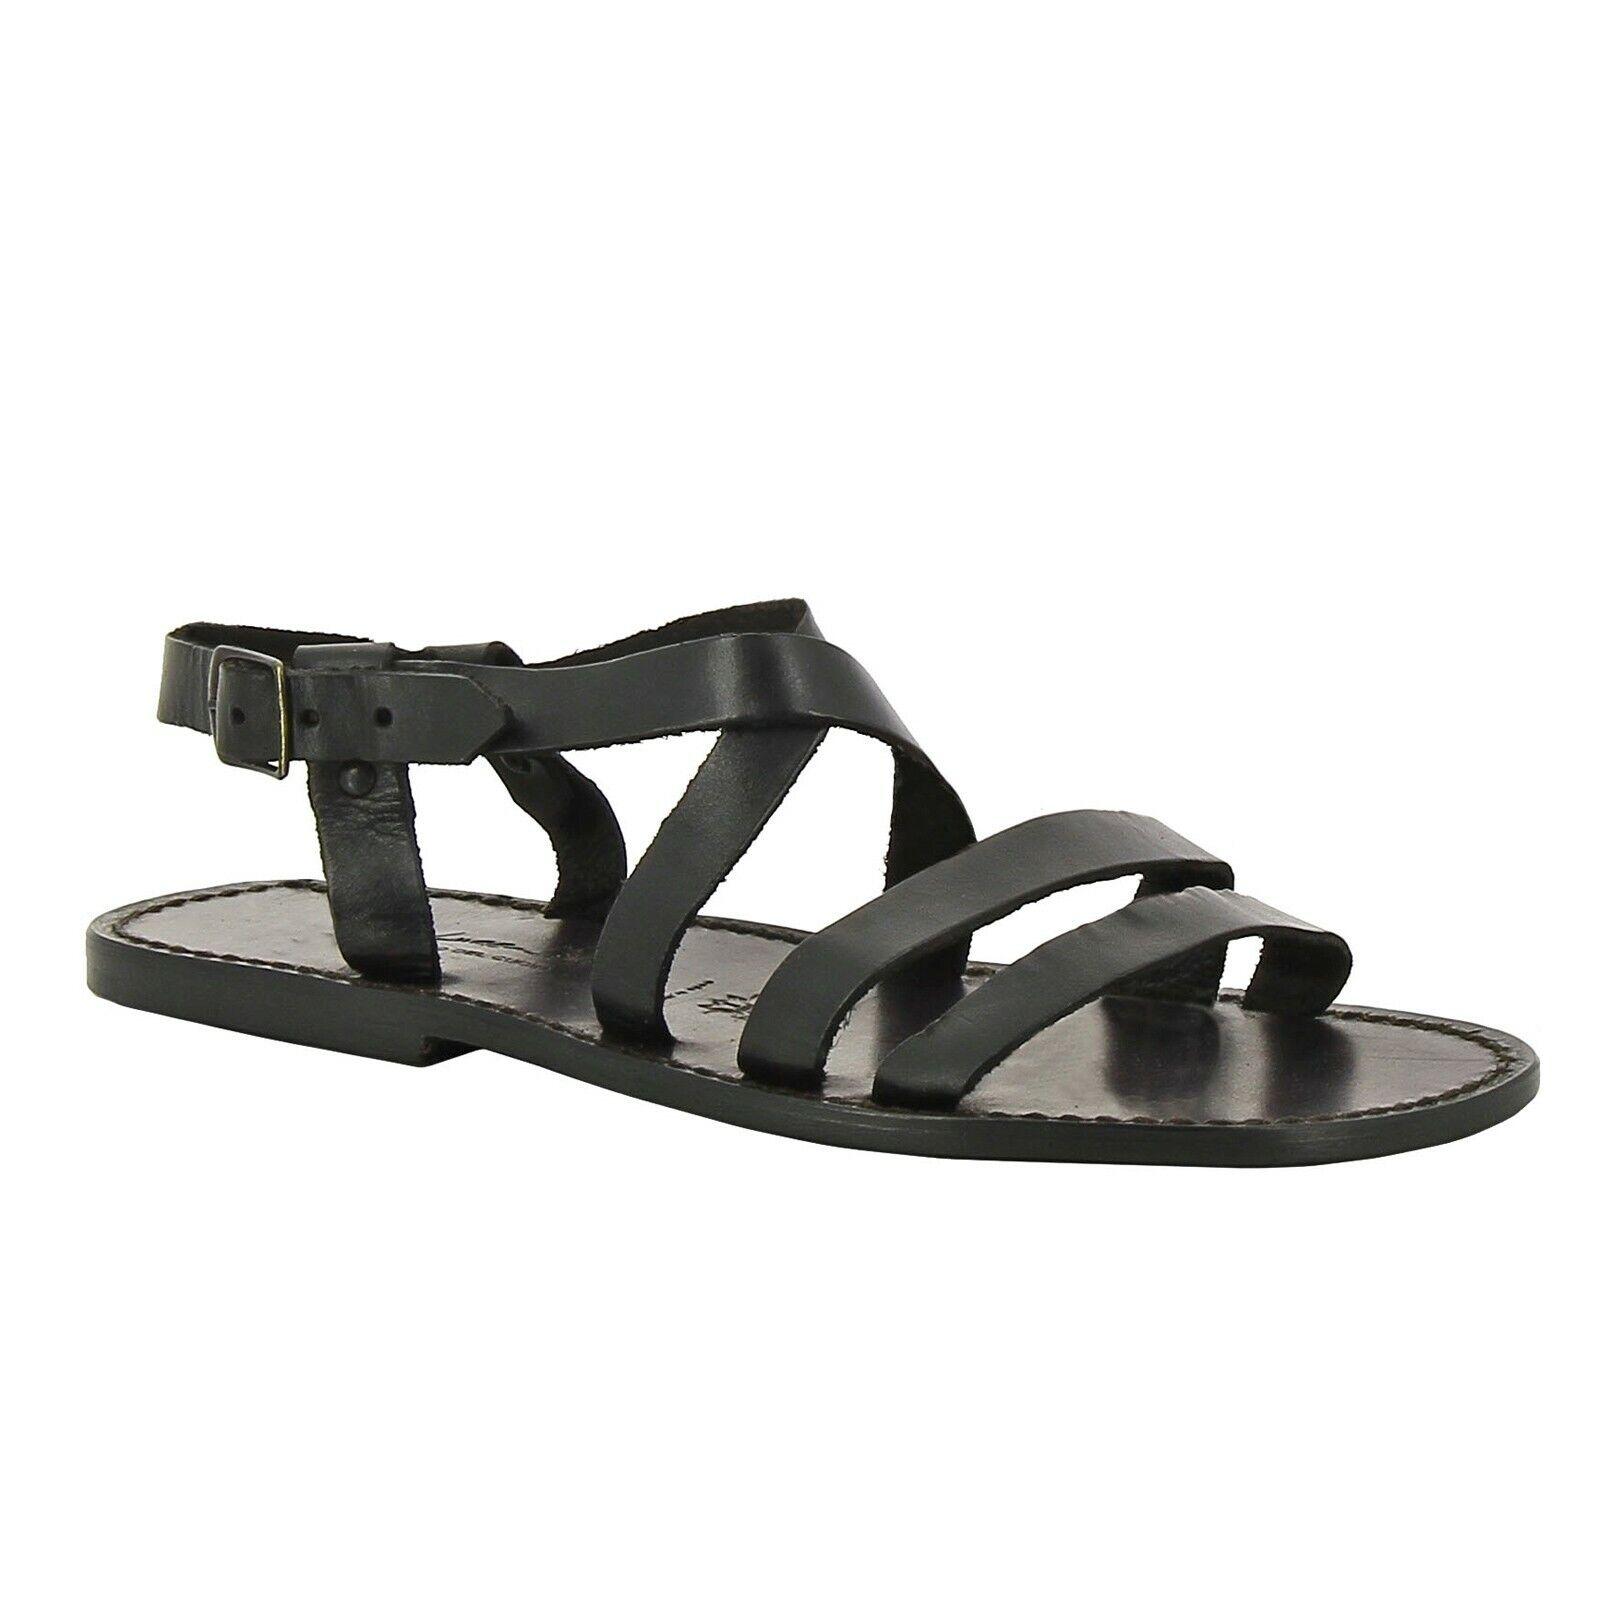 Handmade gladiator flat open sandals for men black genuine leather Italian shoes